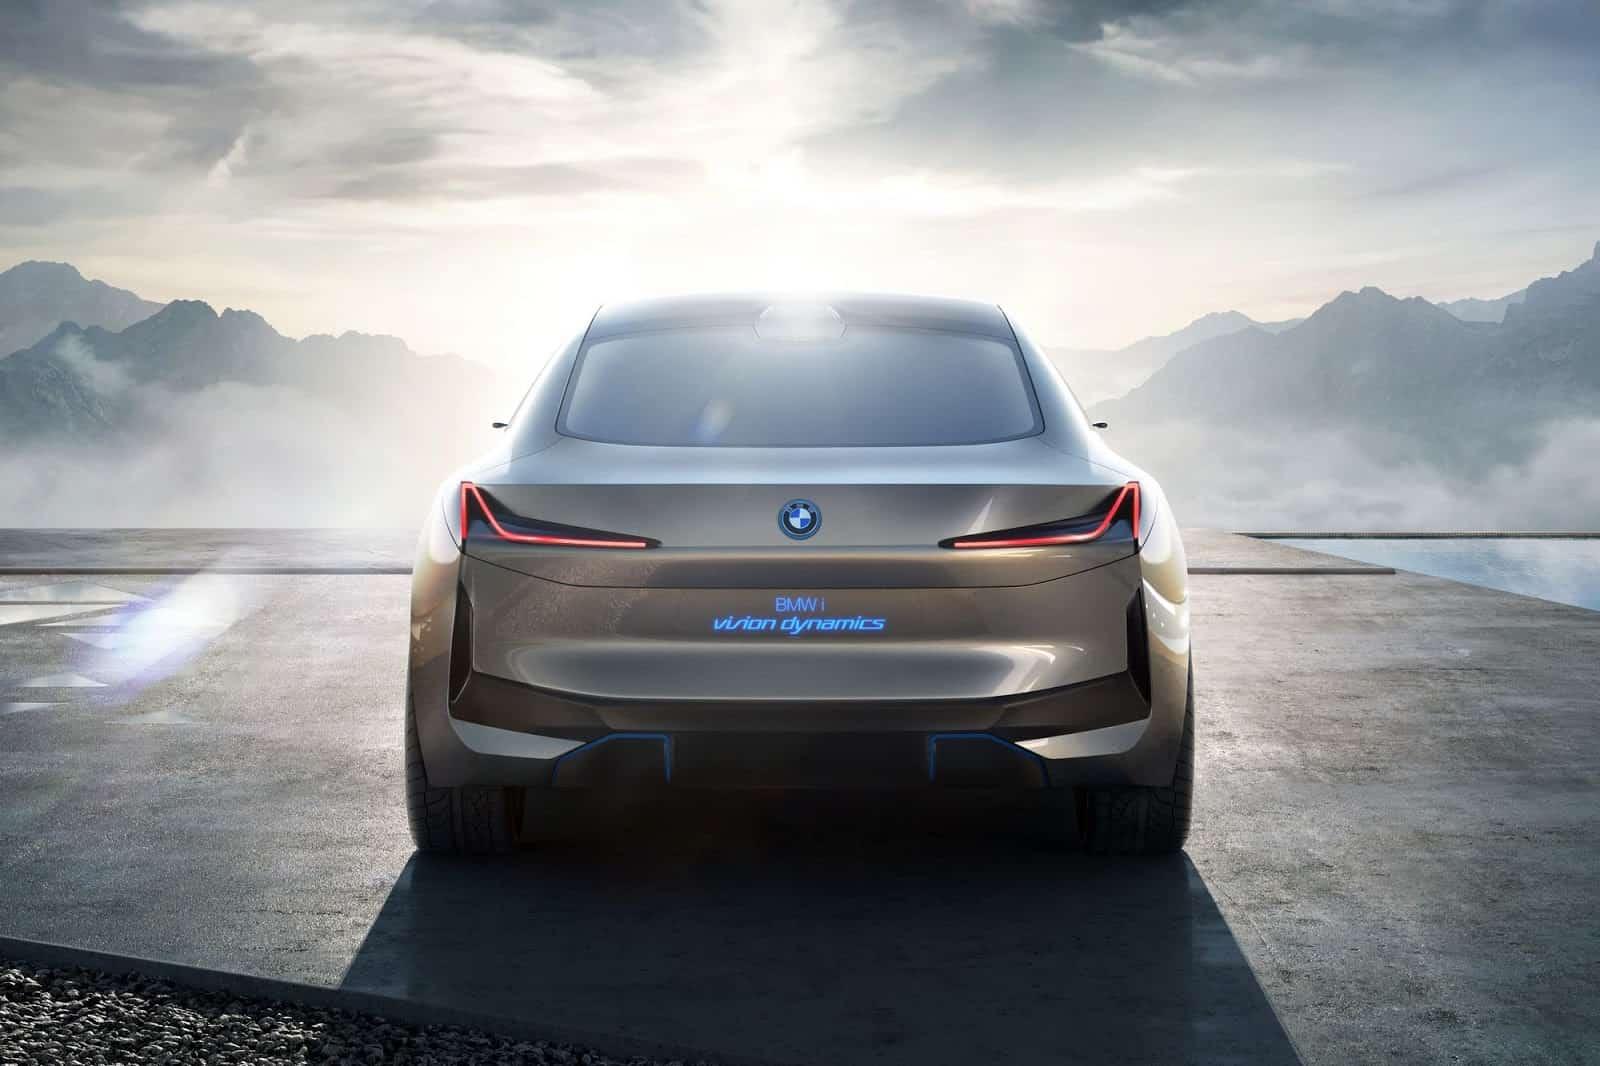 BMW-i-Vision-Dynamics-14